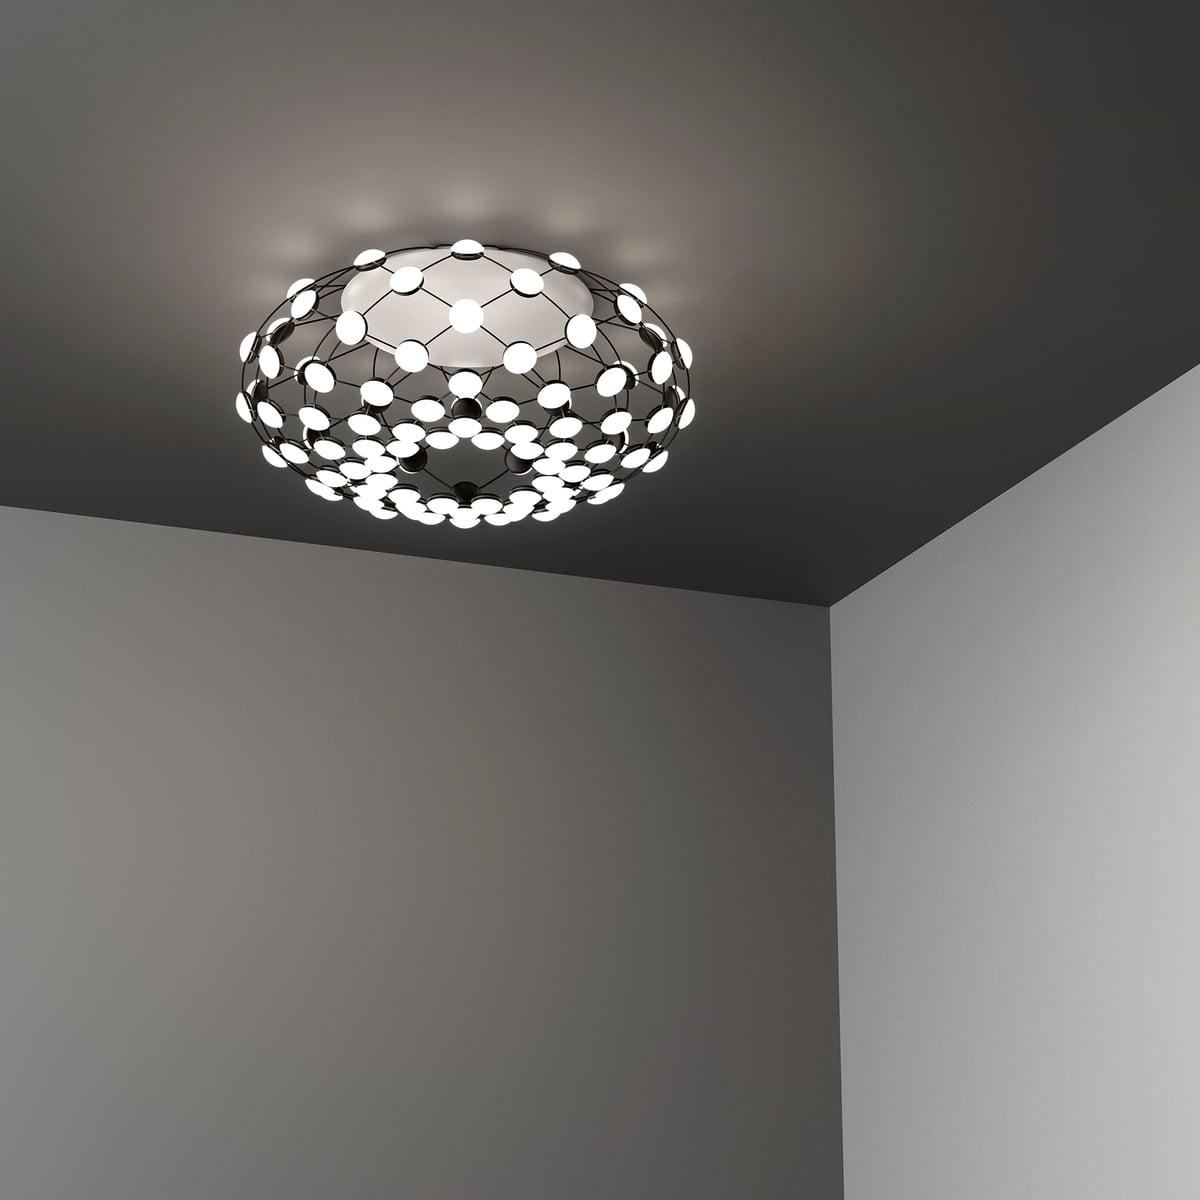 Luceplan Mesh Ceiling Lamp D86pl O 72 Cm Black